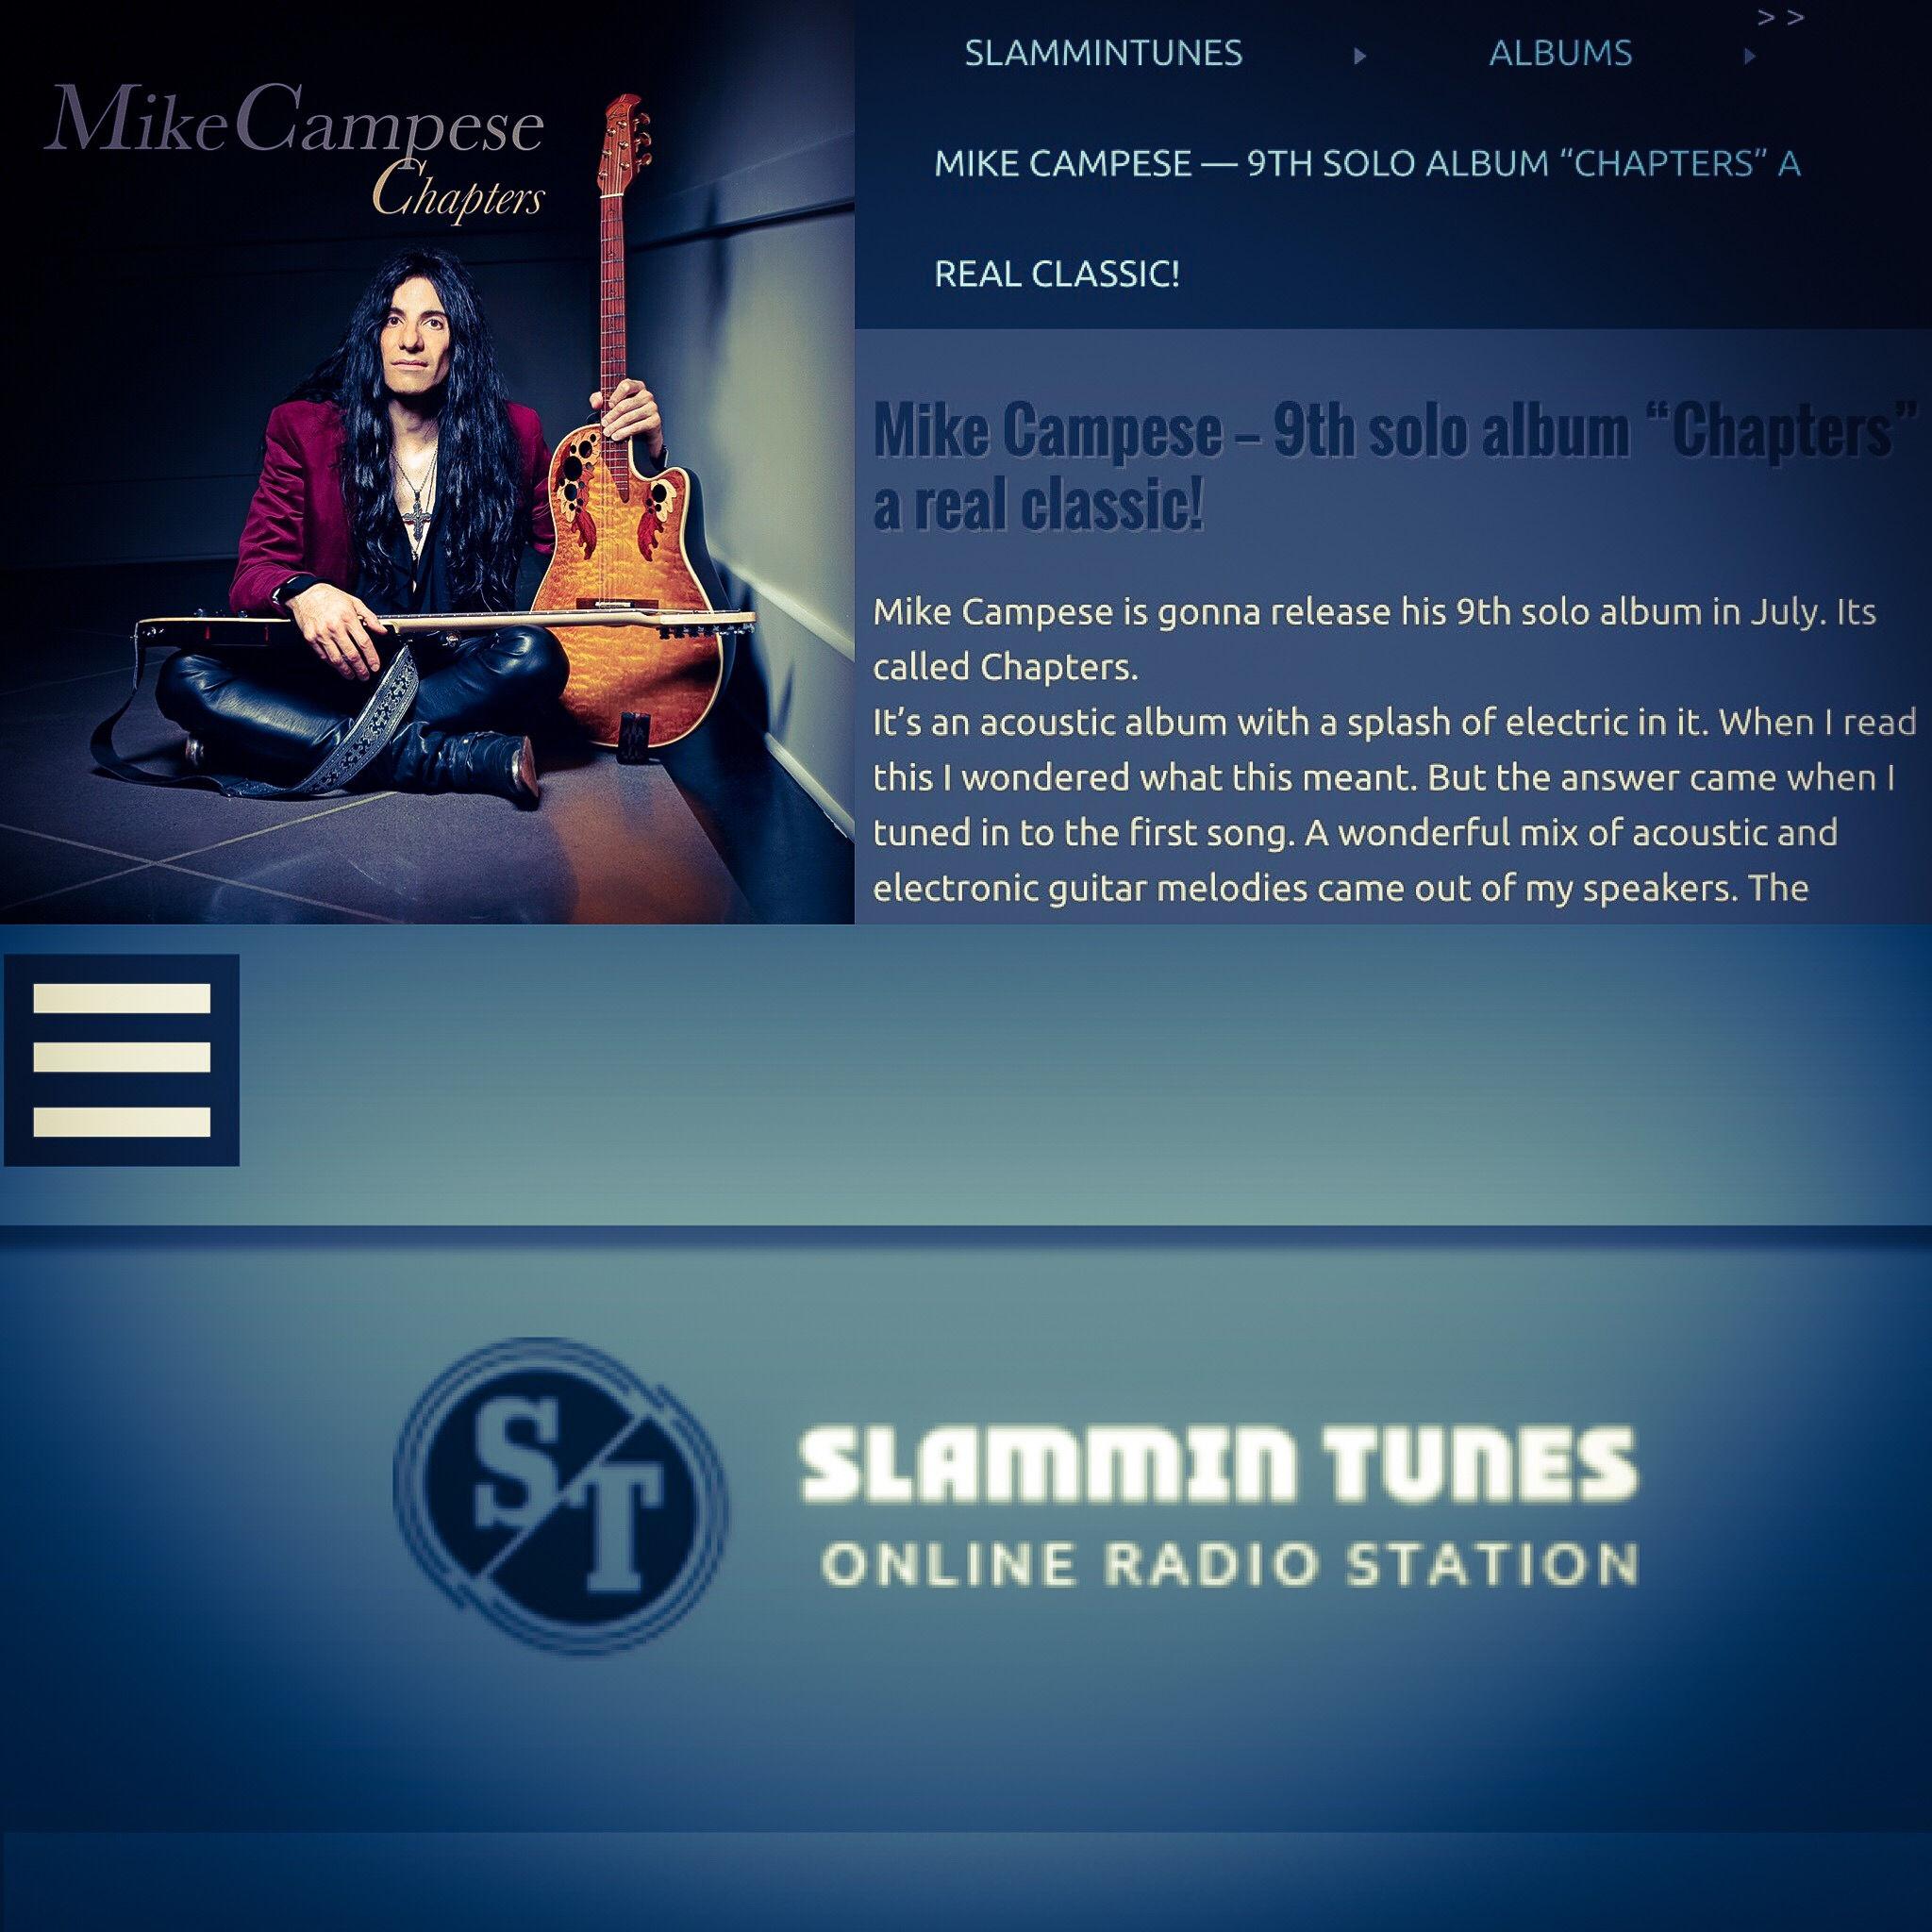 Mike Campese - Slammin Tunes Online Radio